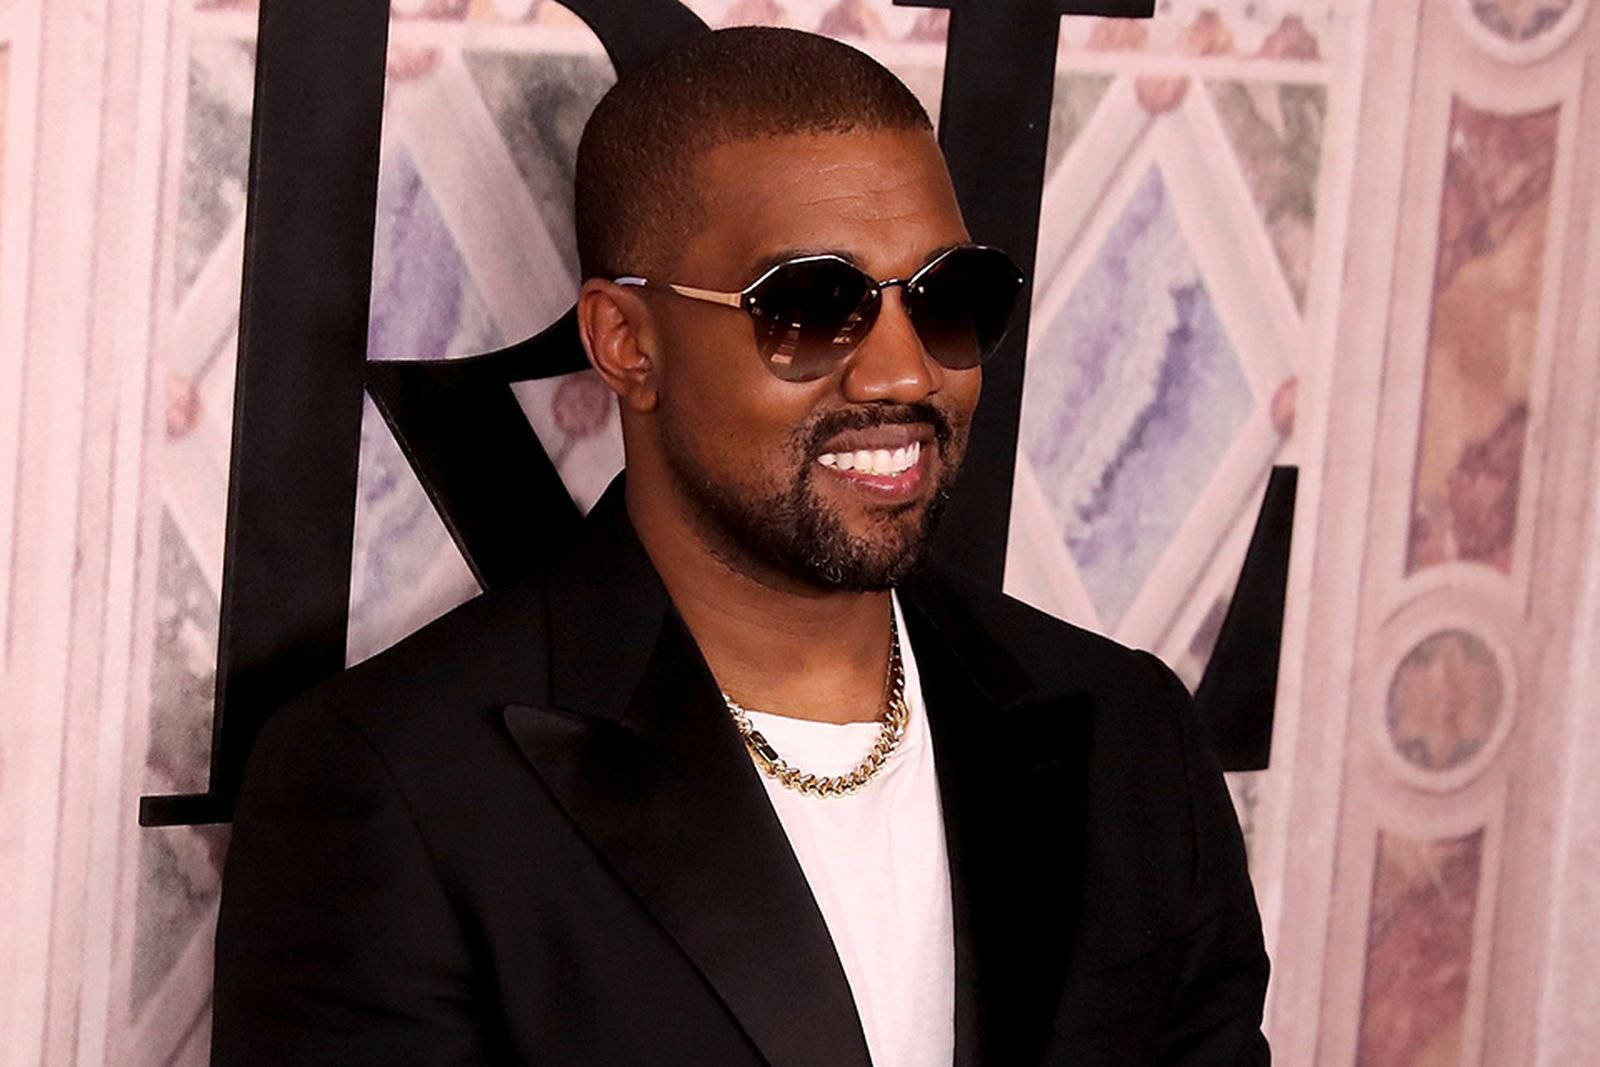 kanye west homeless rapper Music Modernization Act White House donald trump